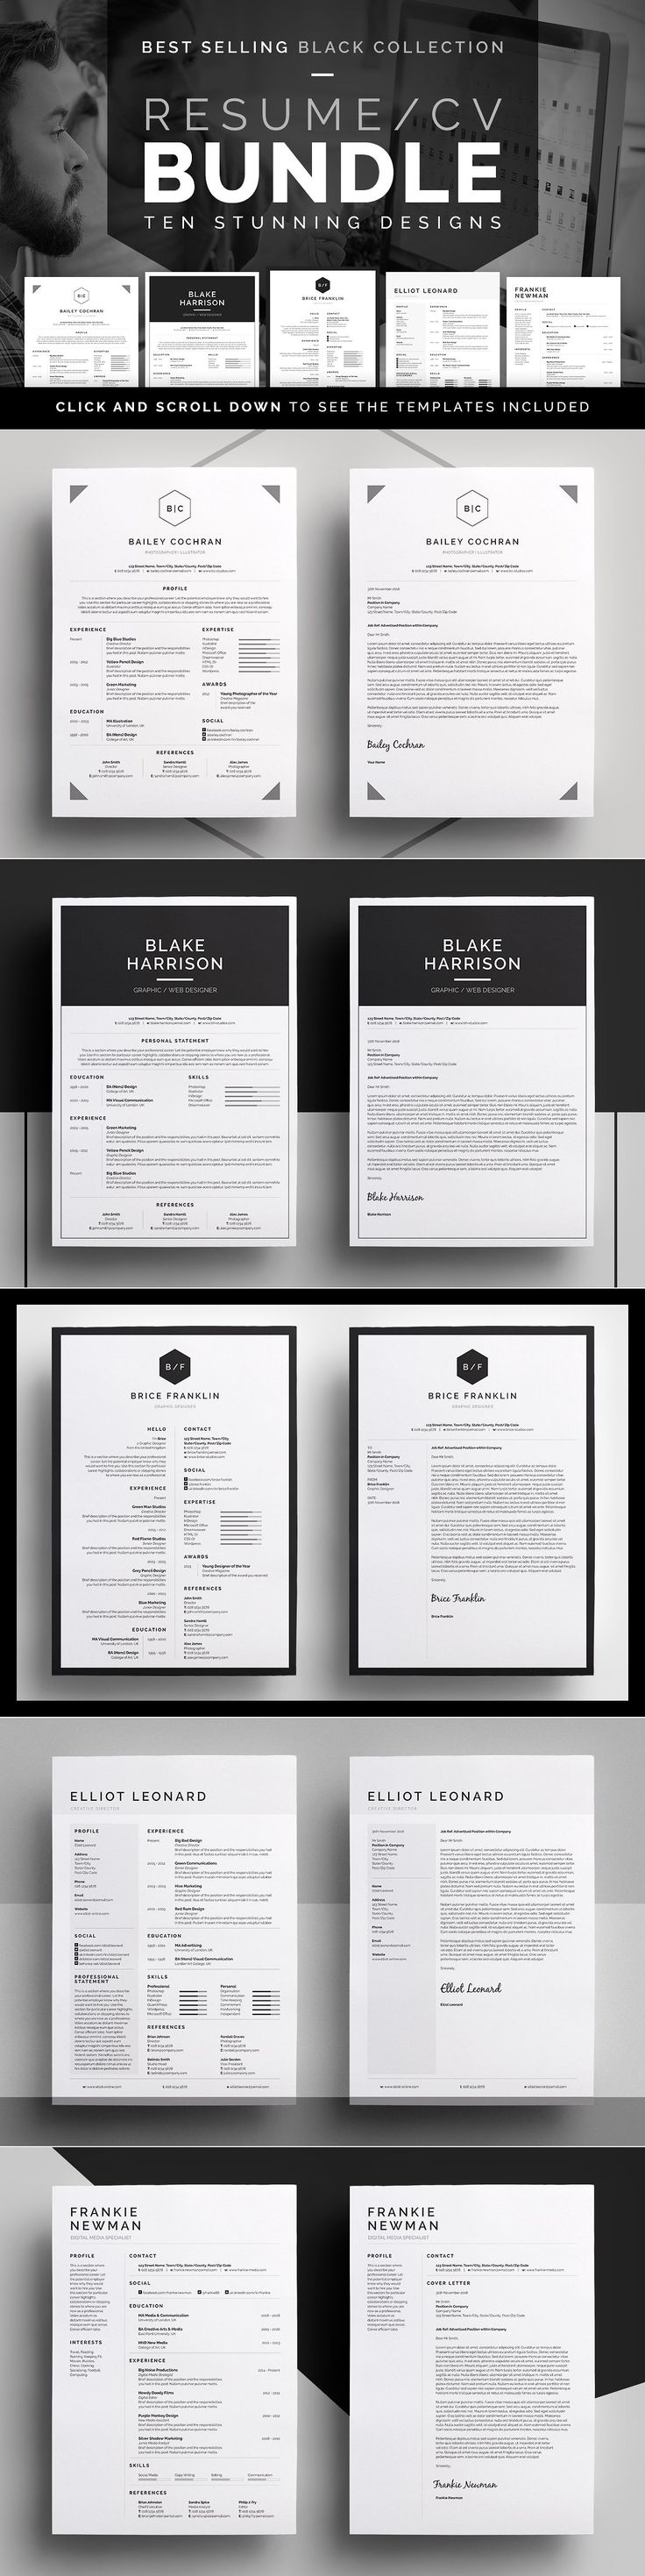 Resume/CV Bundle - Black Collection by bilmaw creative on @creativemarket